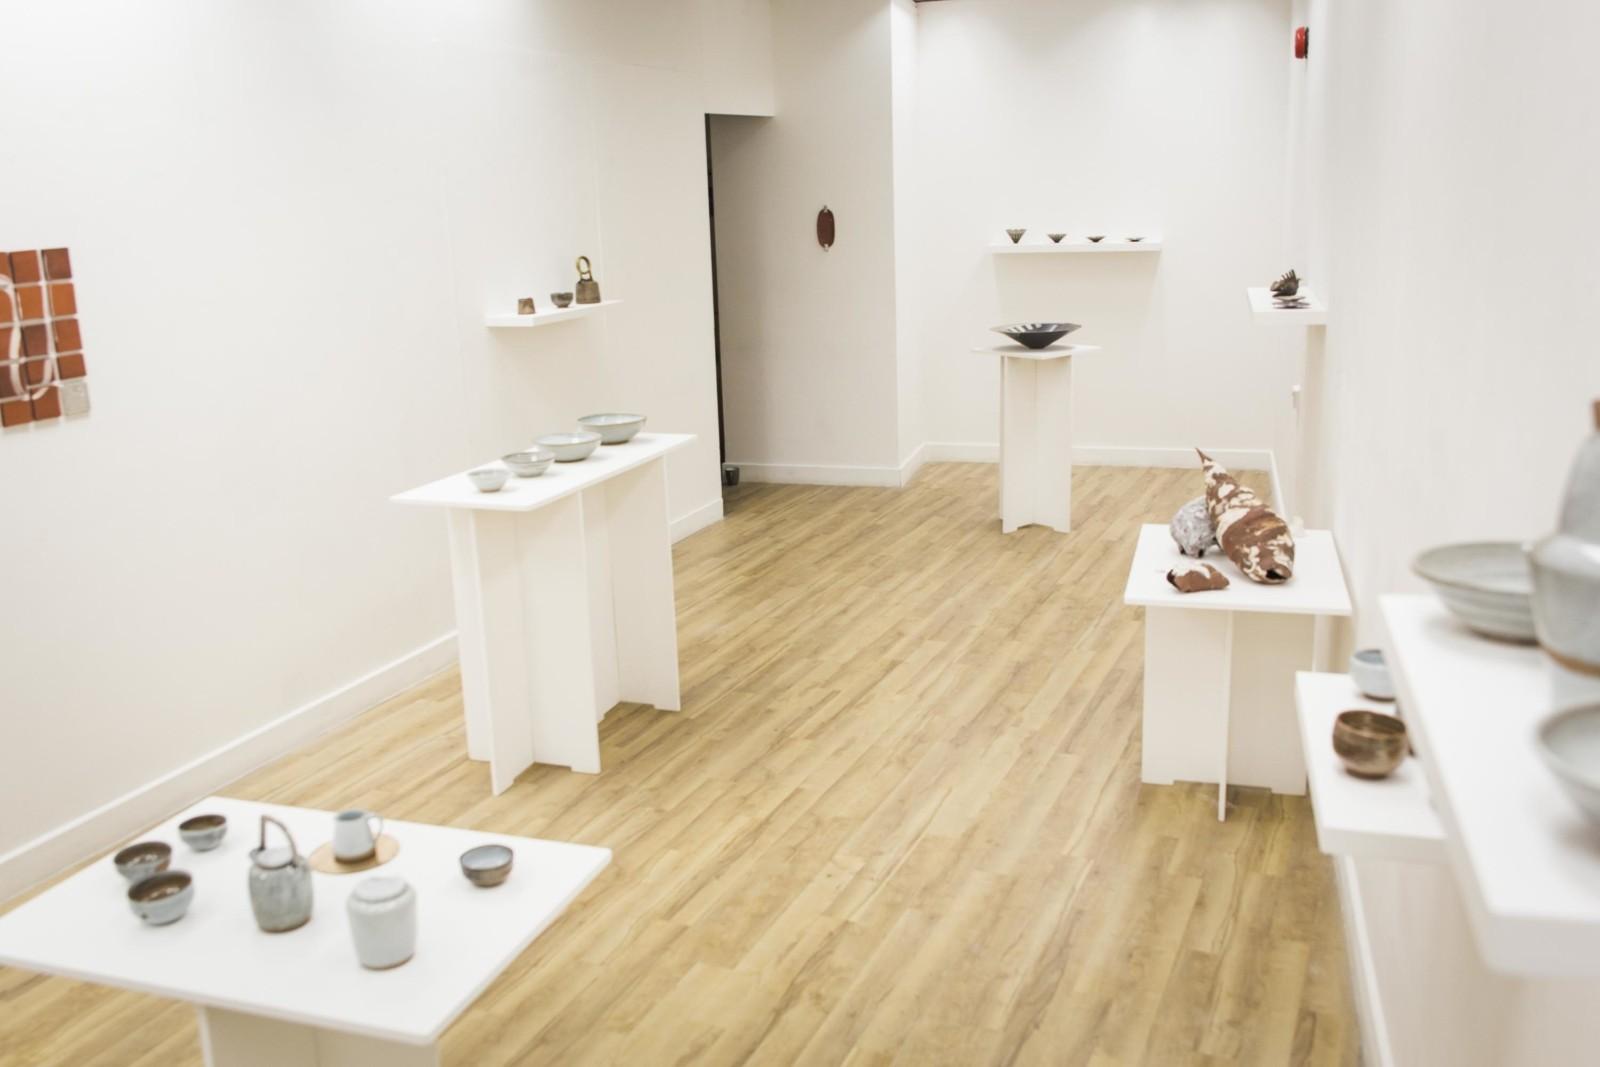 art gallery kunst galerie keramik, metal